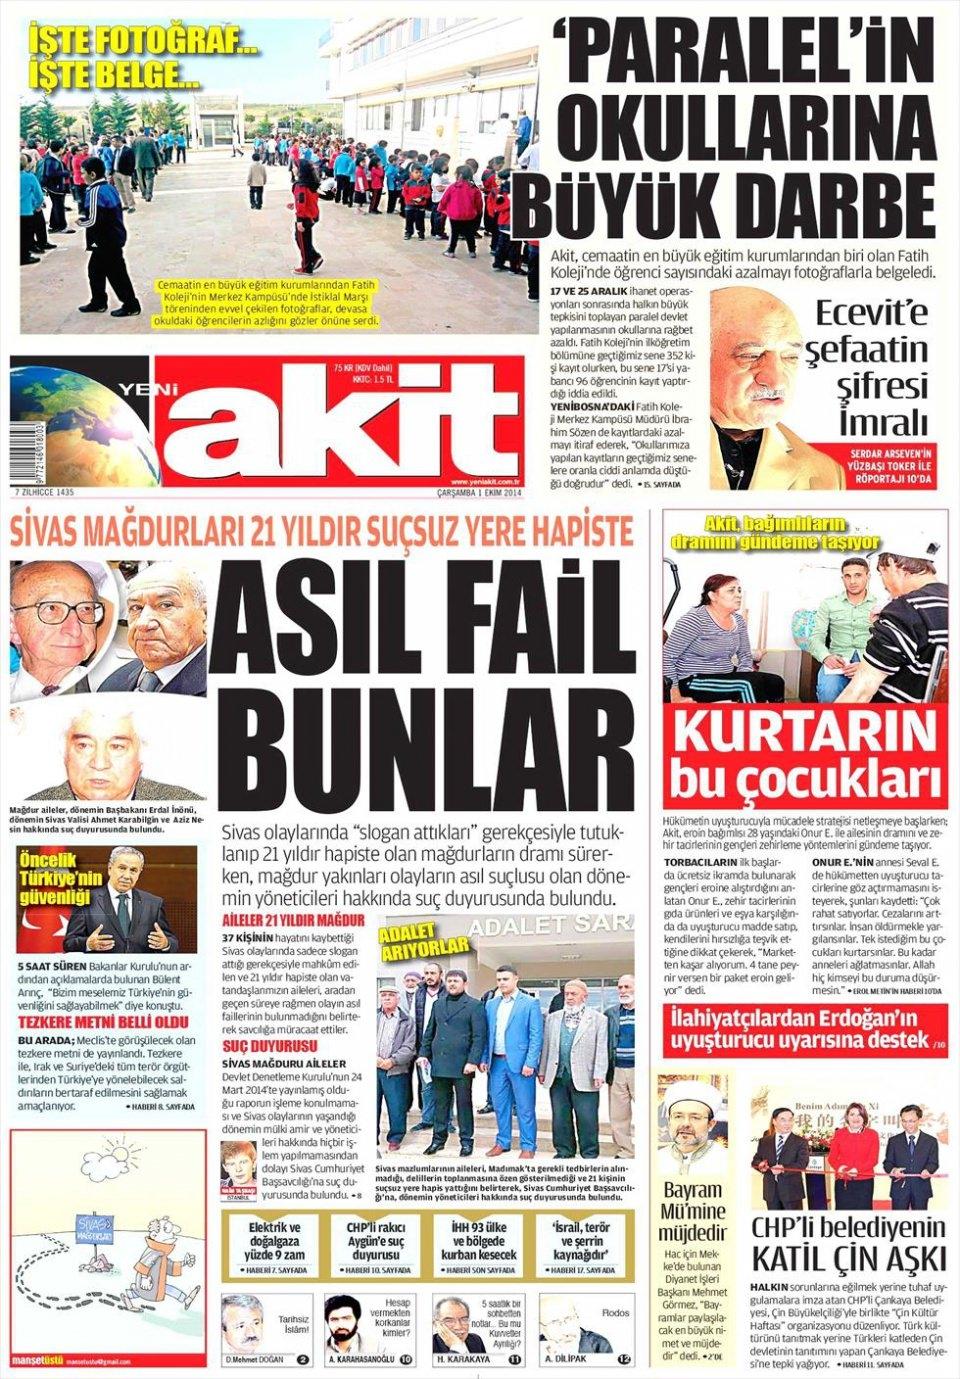 1 Ekim 2014 gazete manşetleri 22